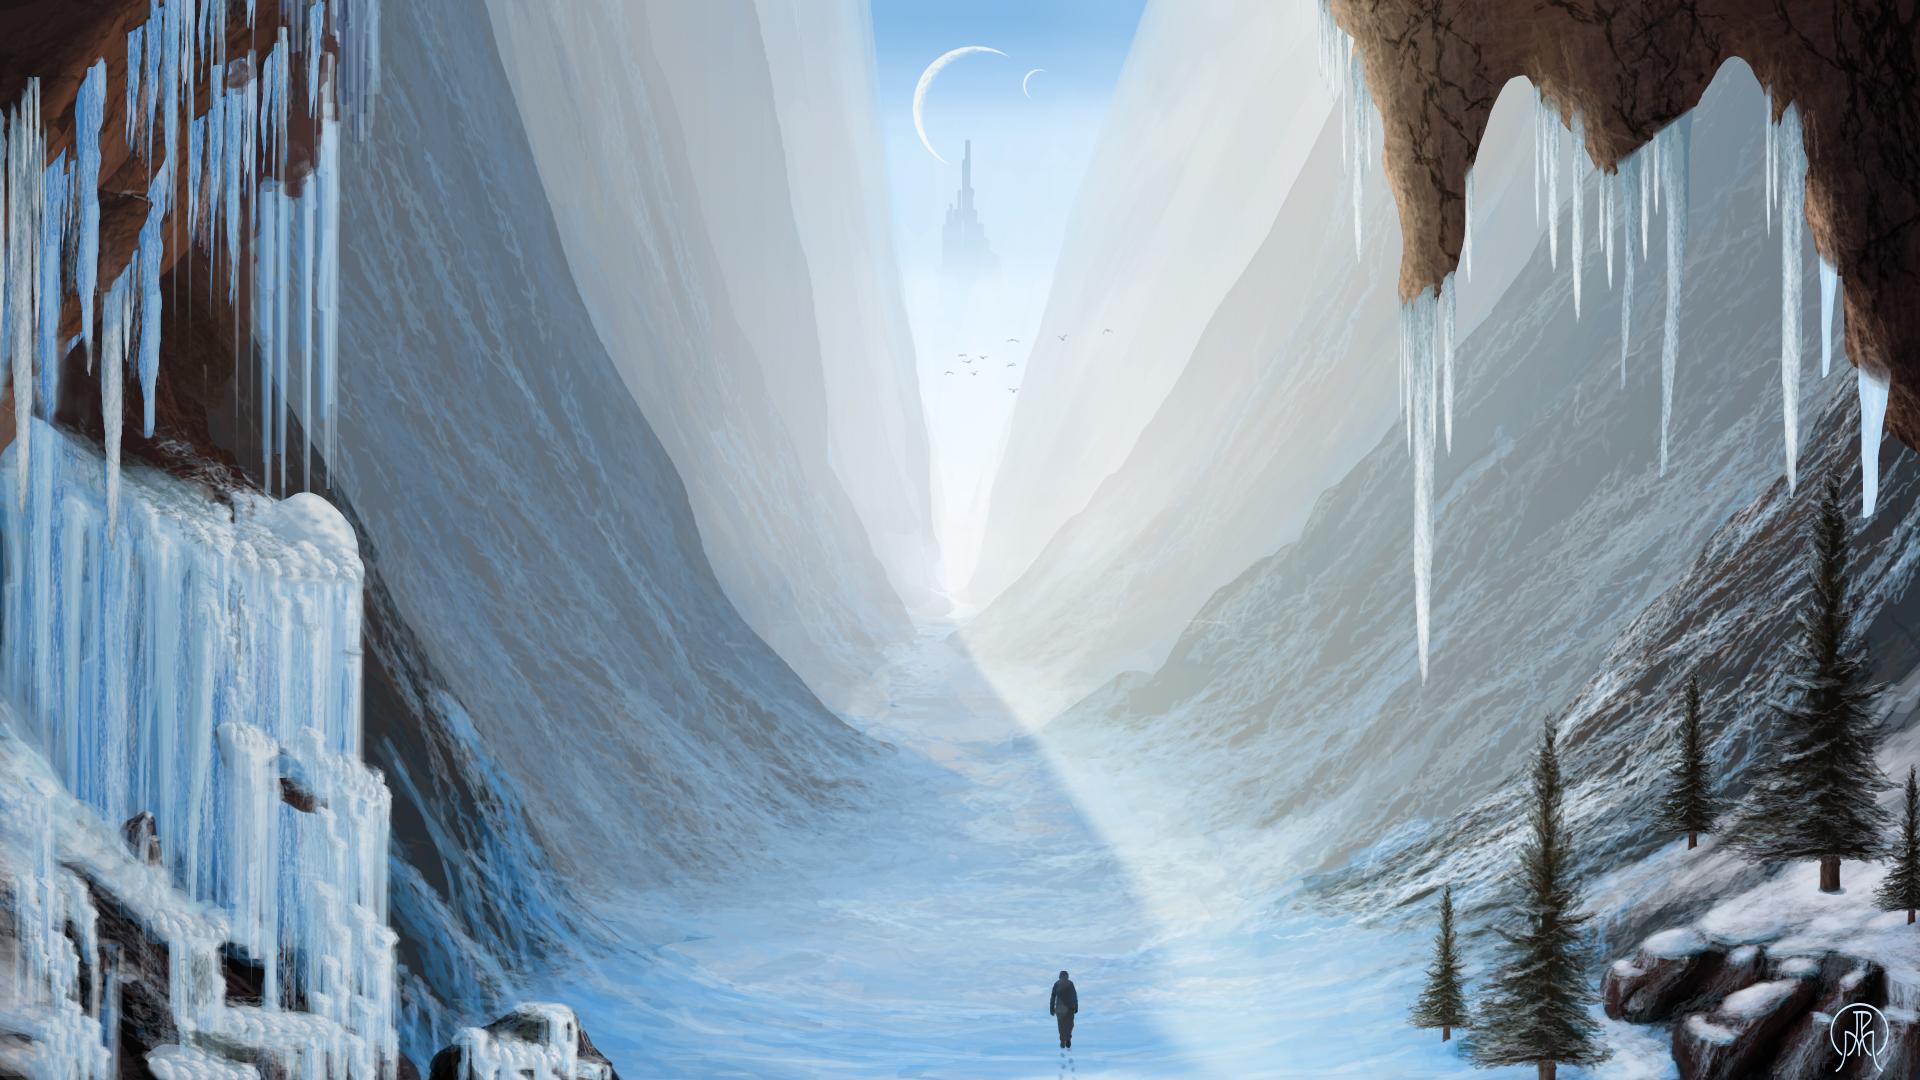 Through the Snowy Gorge by Spacepretzel